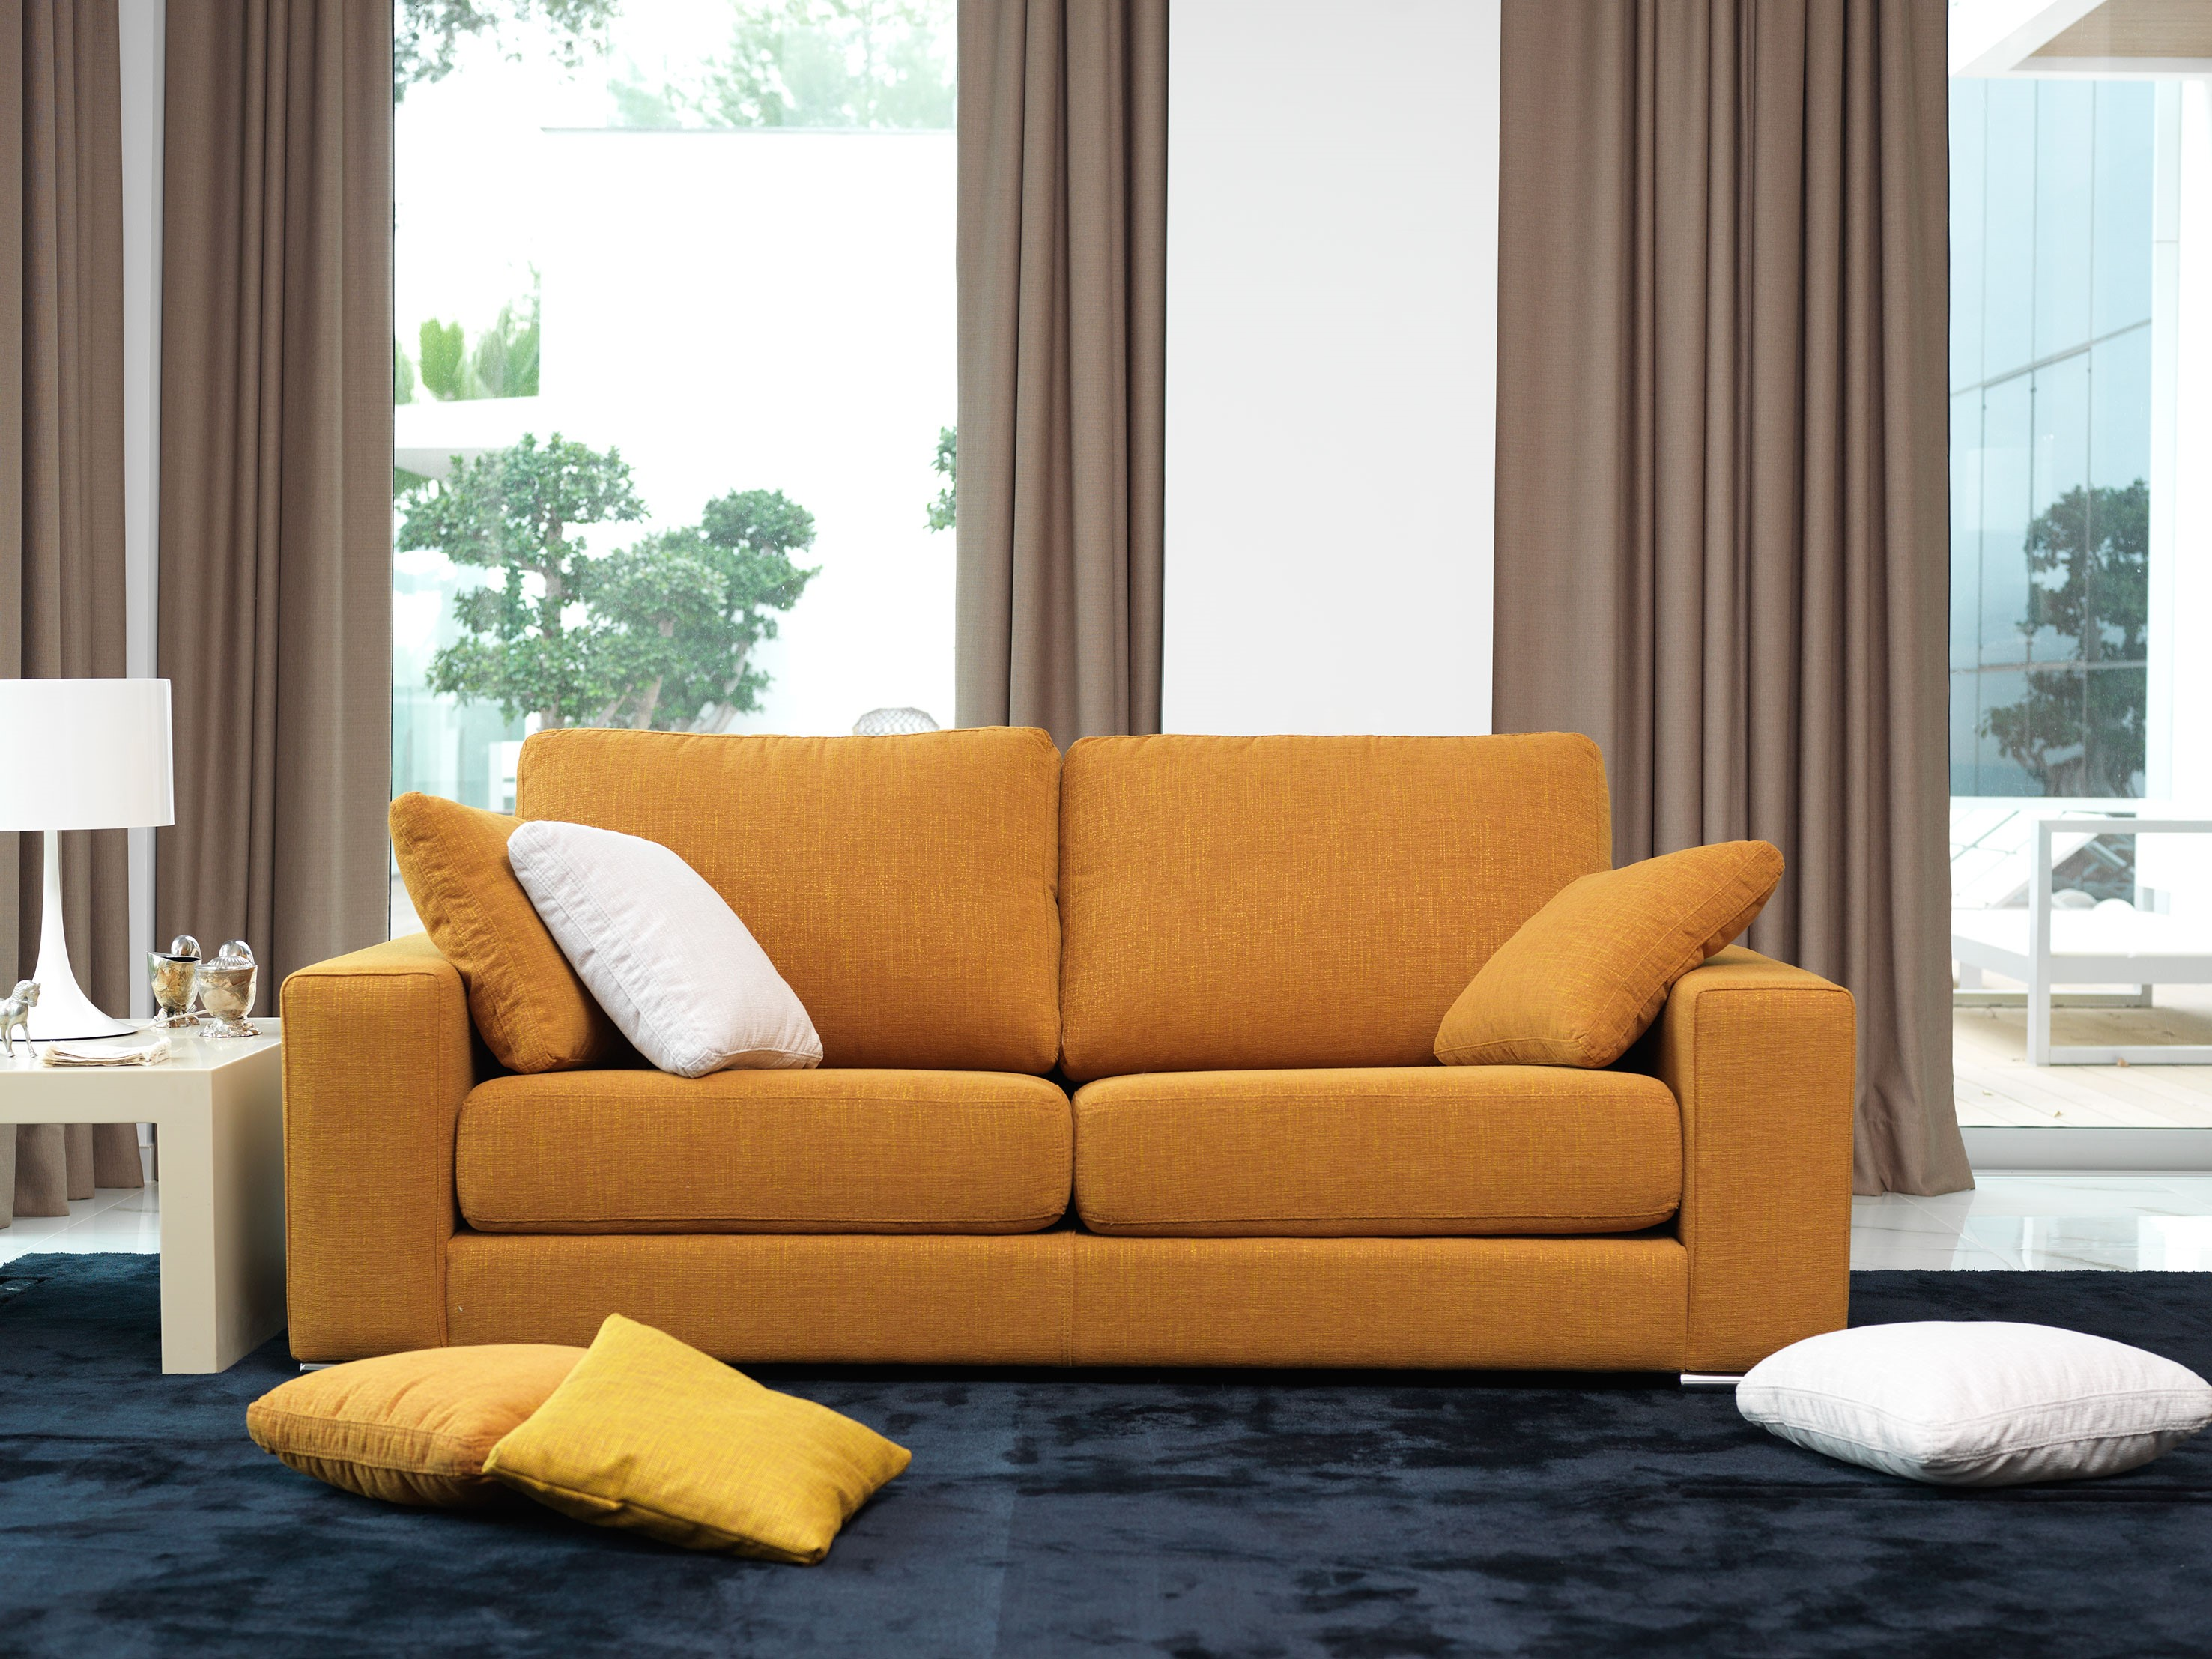 Forrar sofa con tela trendy cmo elegir las telas de las - Telas para sofa ...